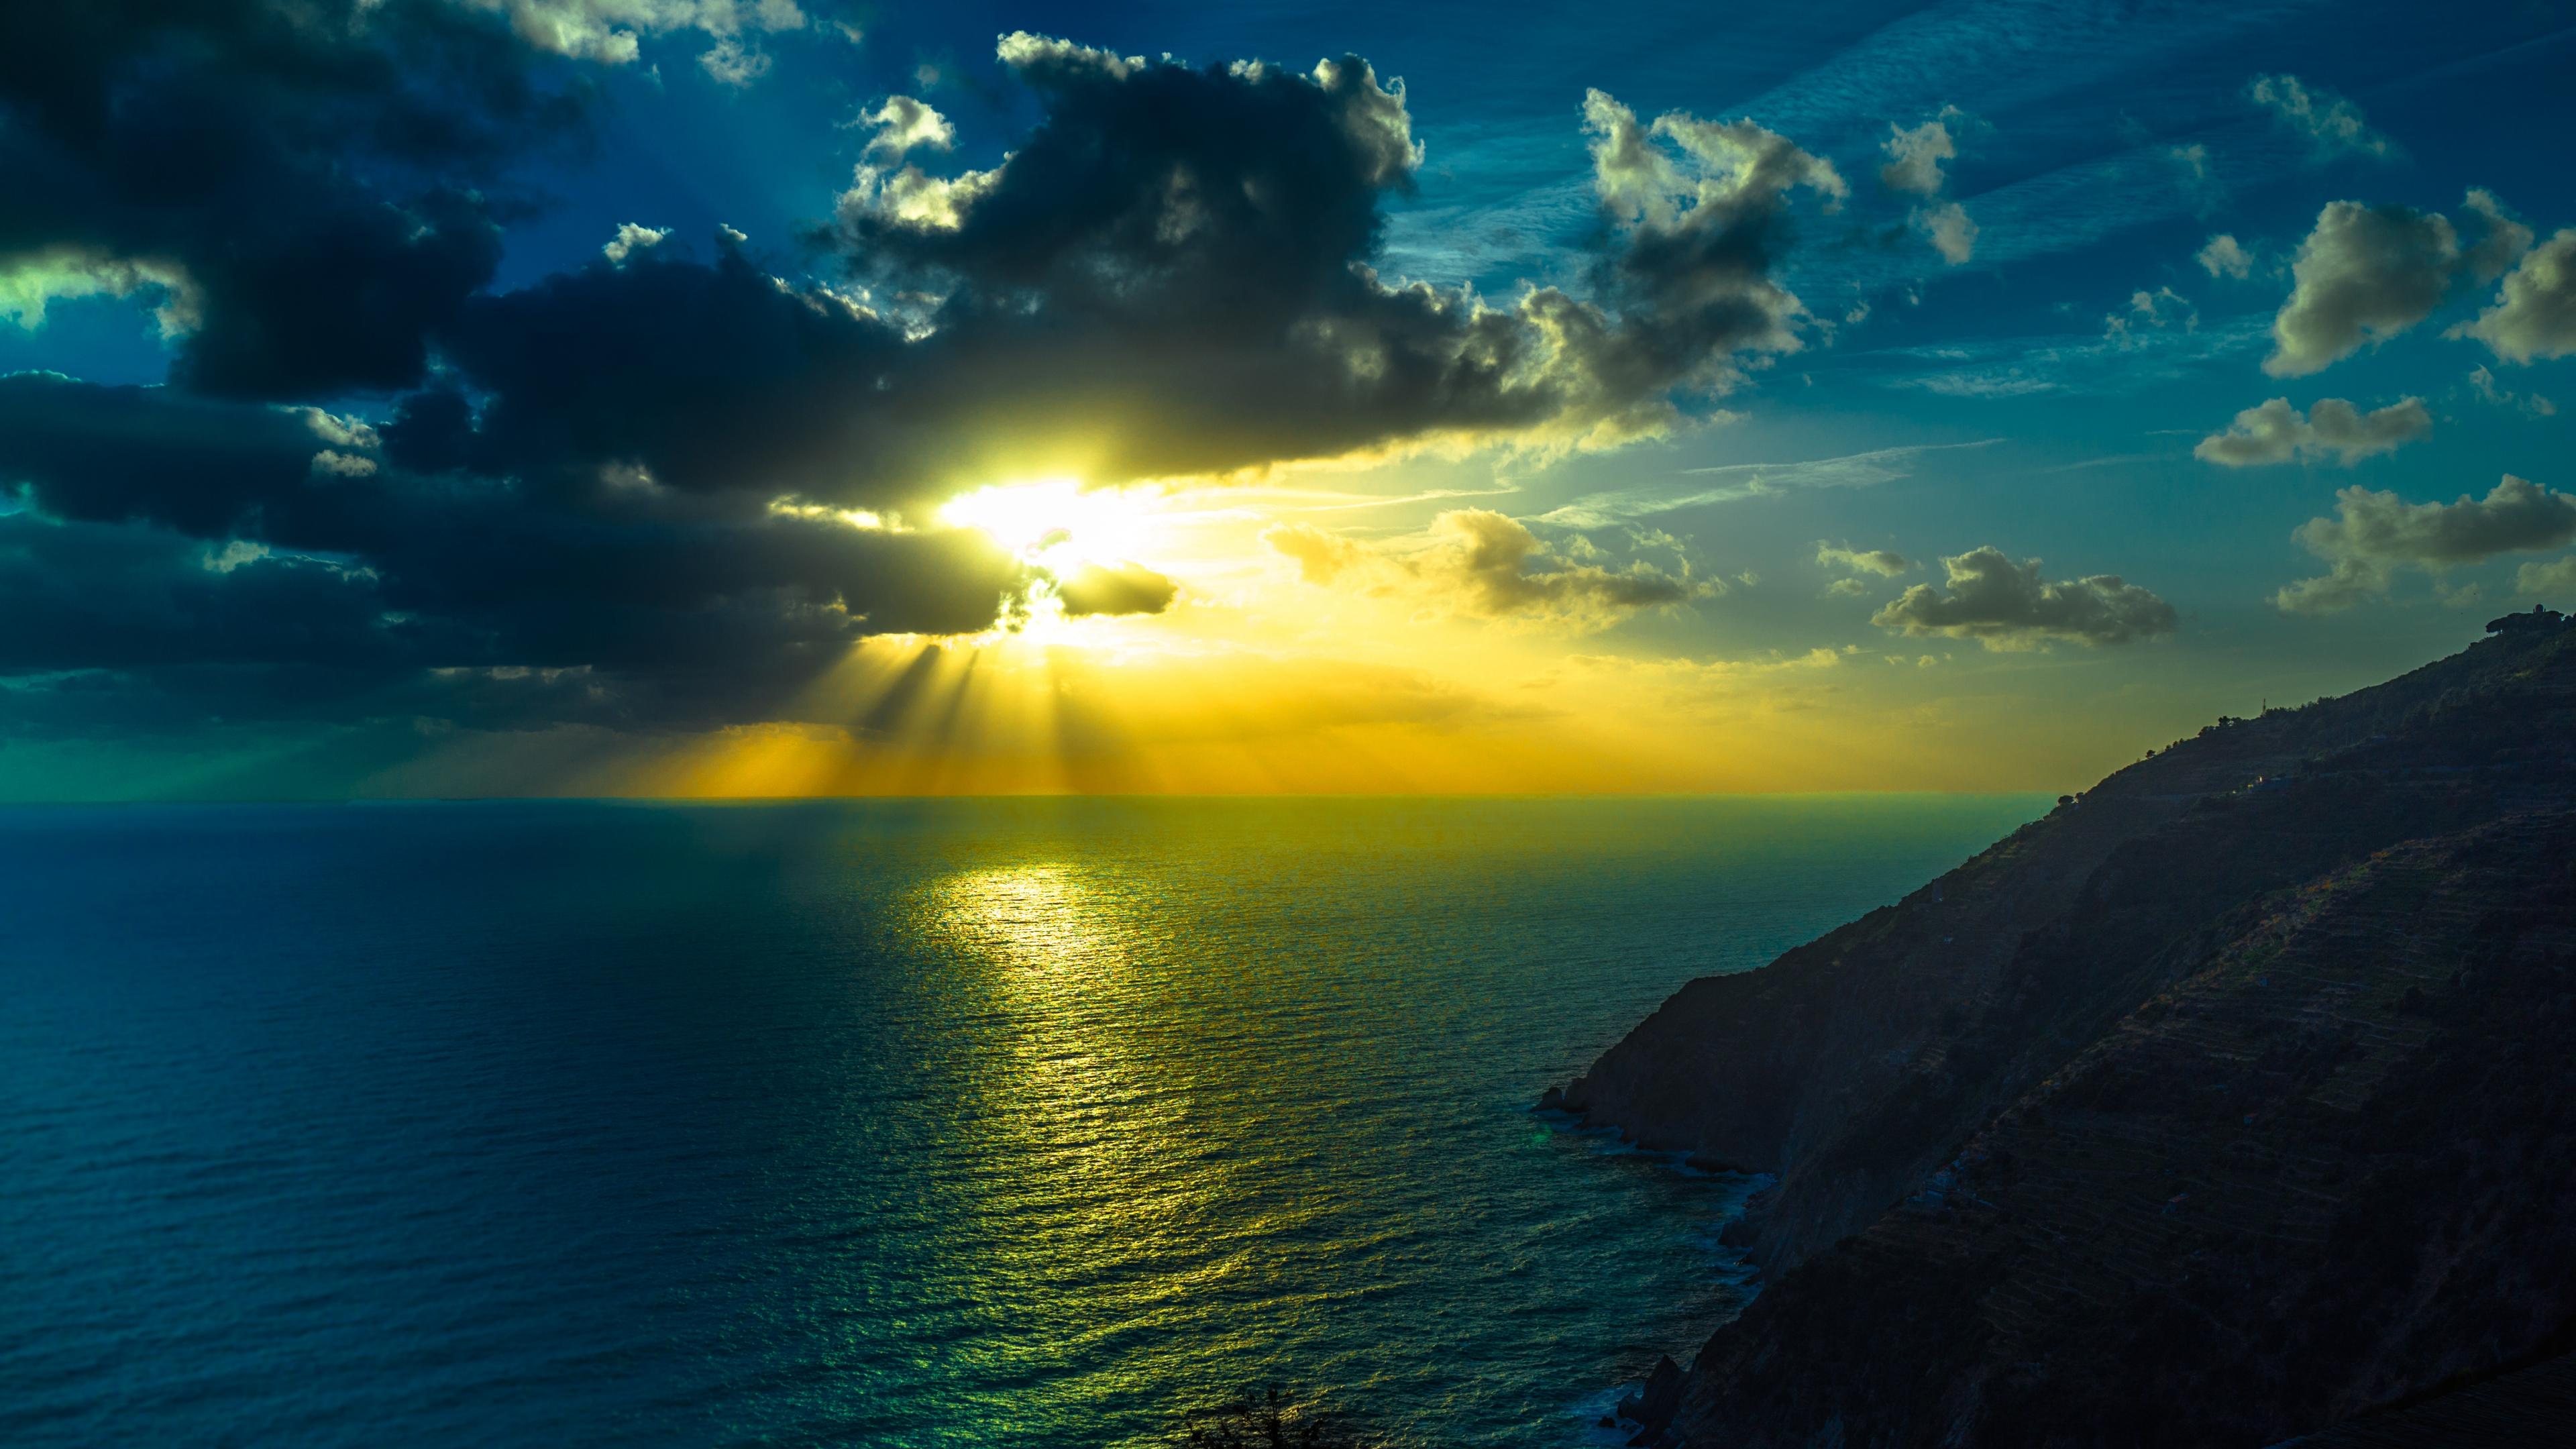 Ultra HD Wallpaper 38402160 mountains sea ocean clouds night 4K 3840x2160